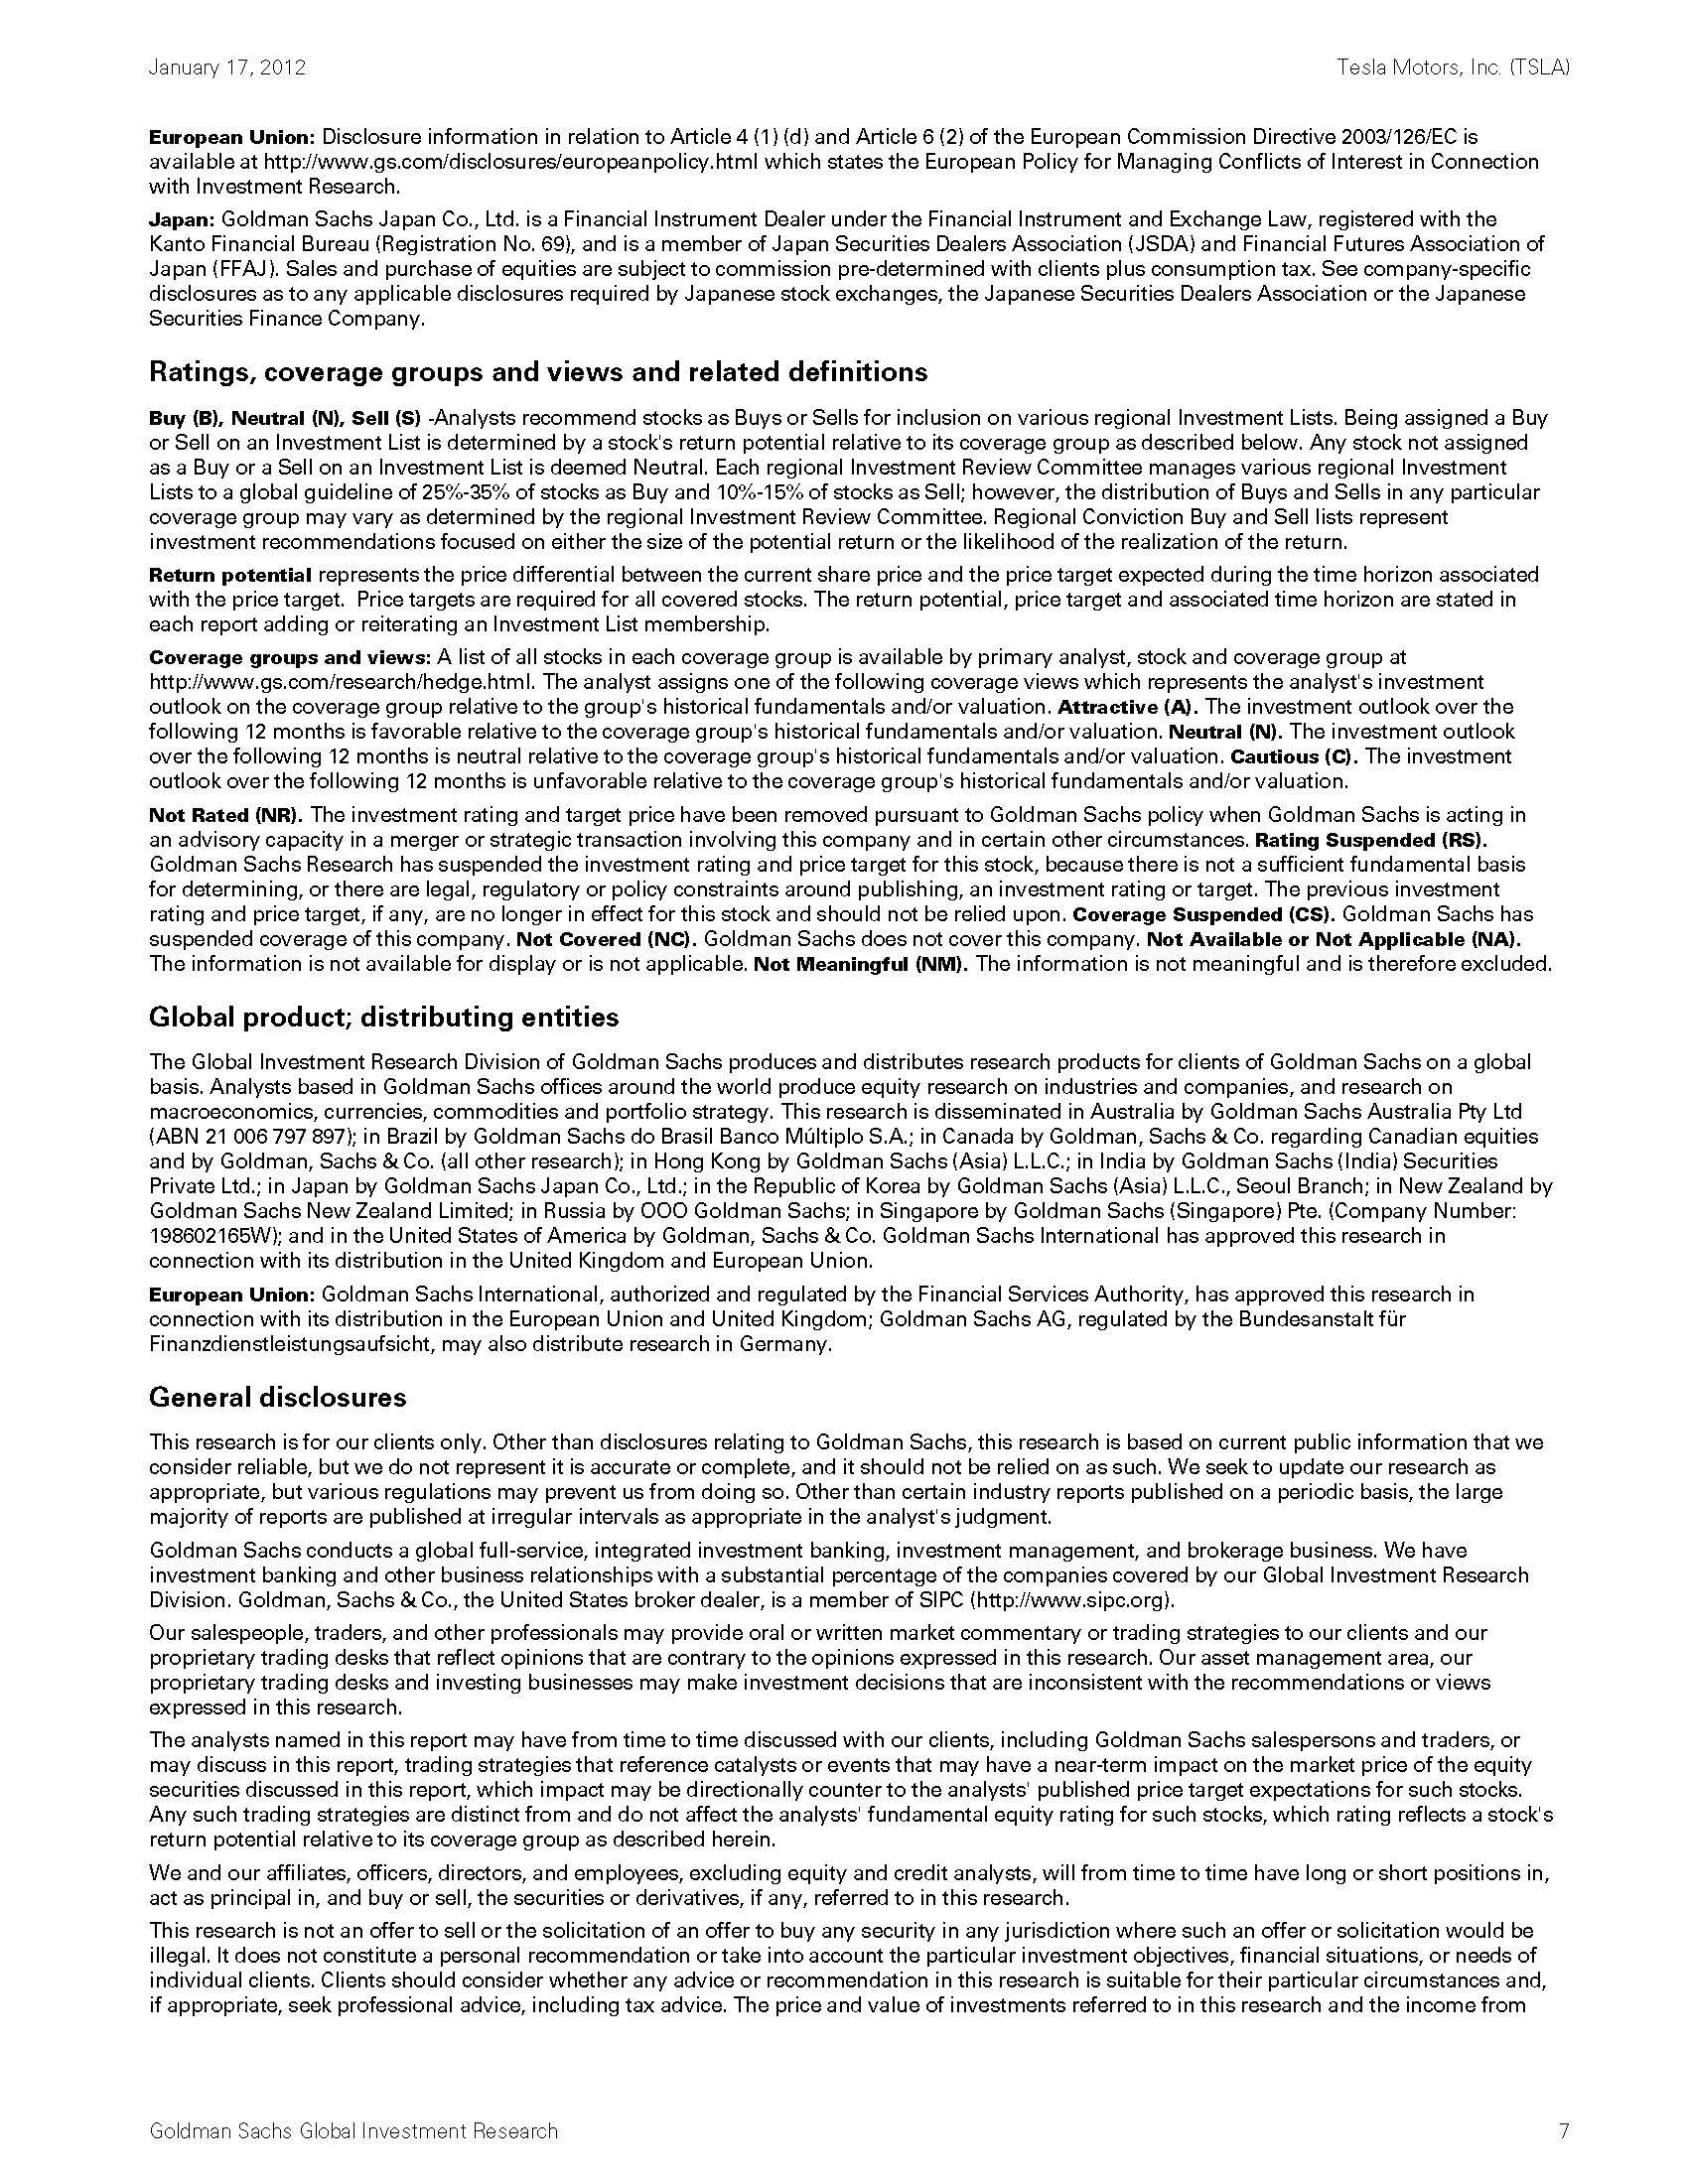 tesla_goldman_Page_7.jpg